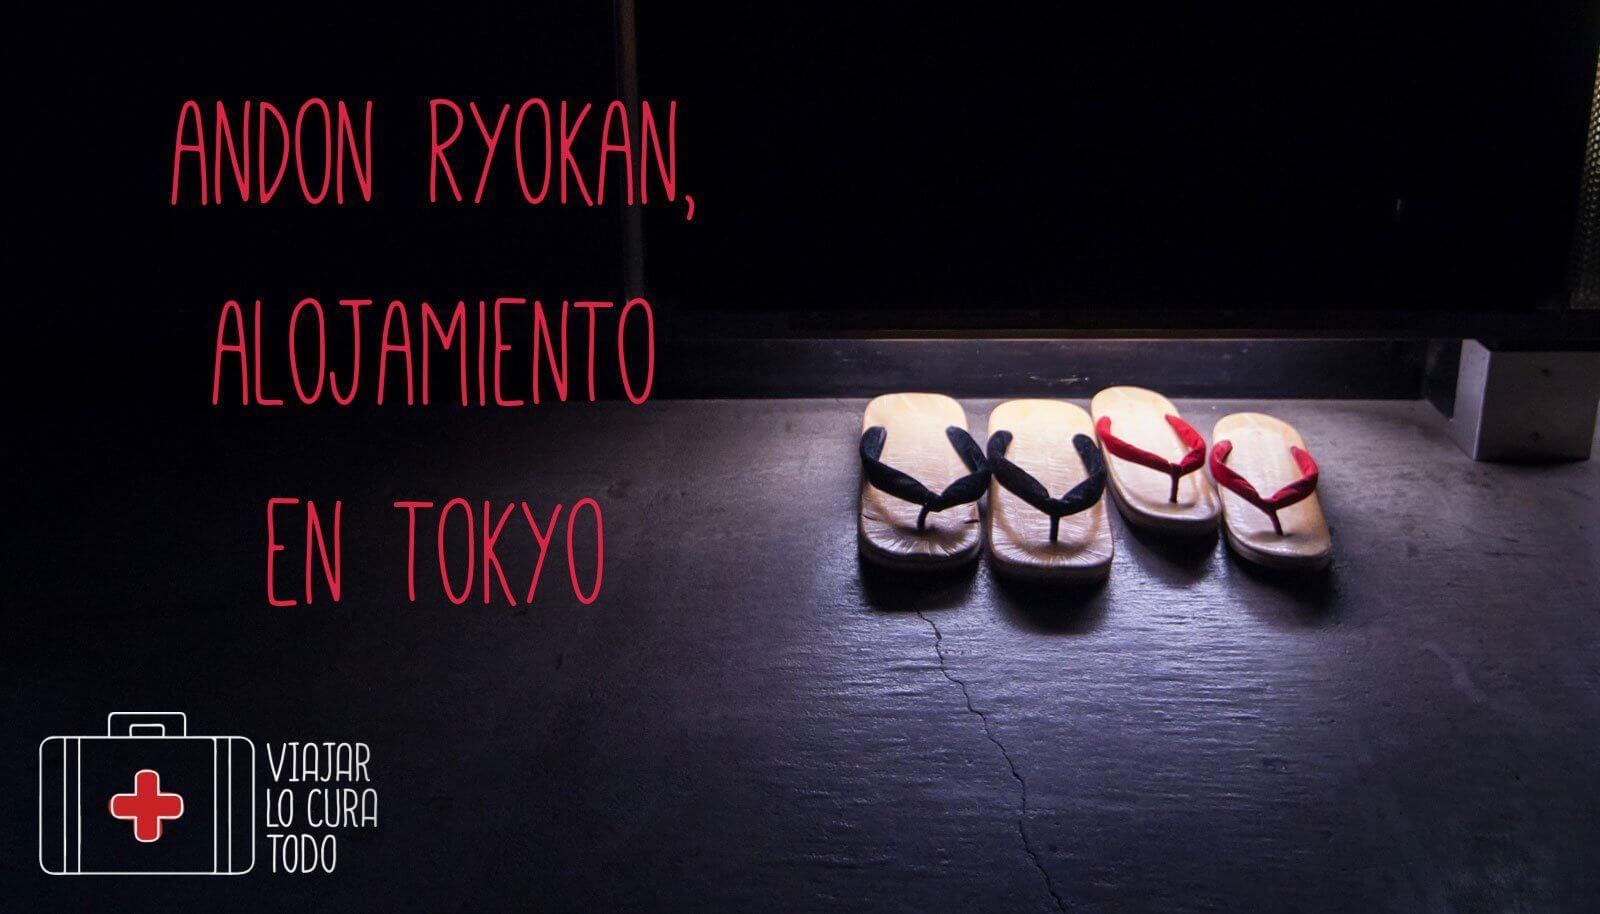 Andon Ryokan, alojamiento en Tokyo